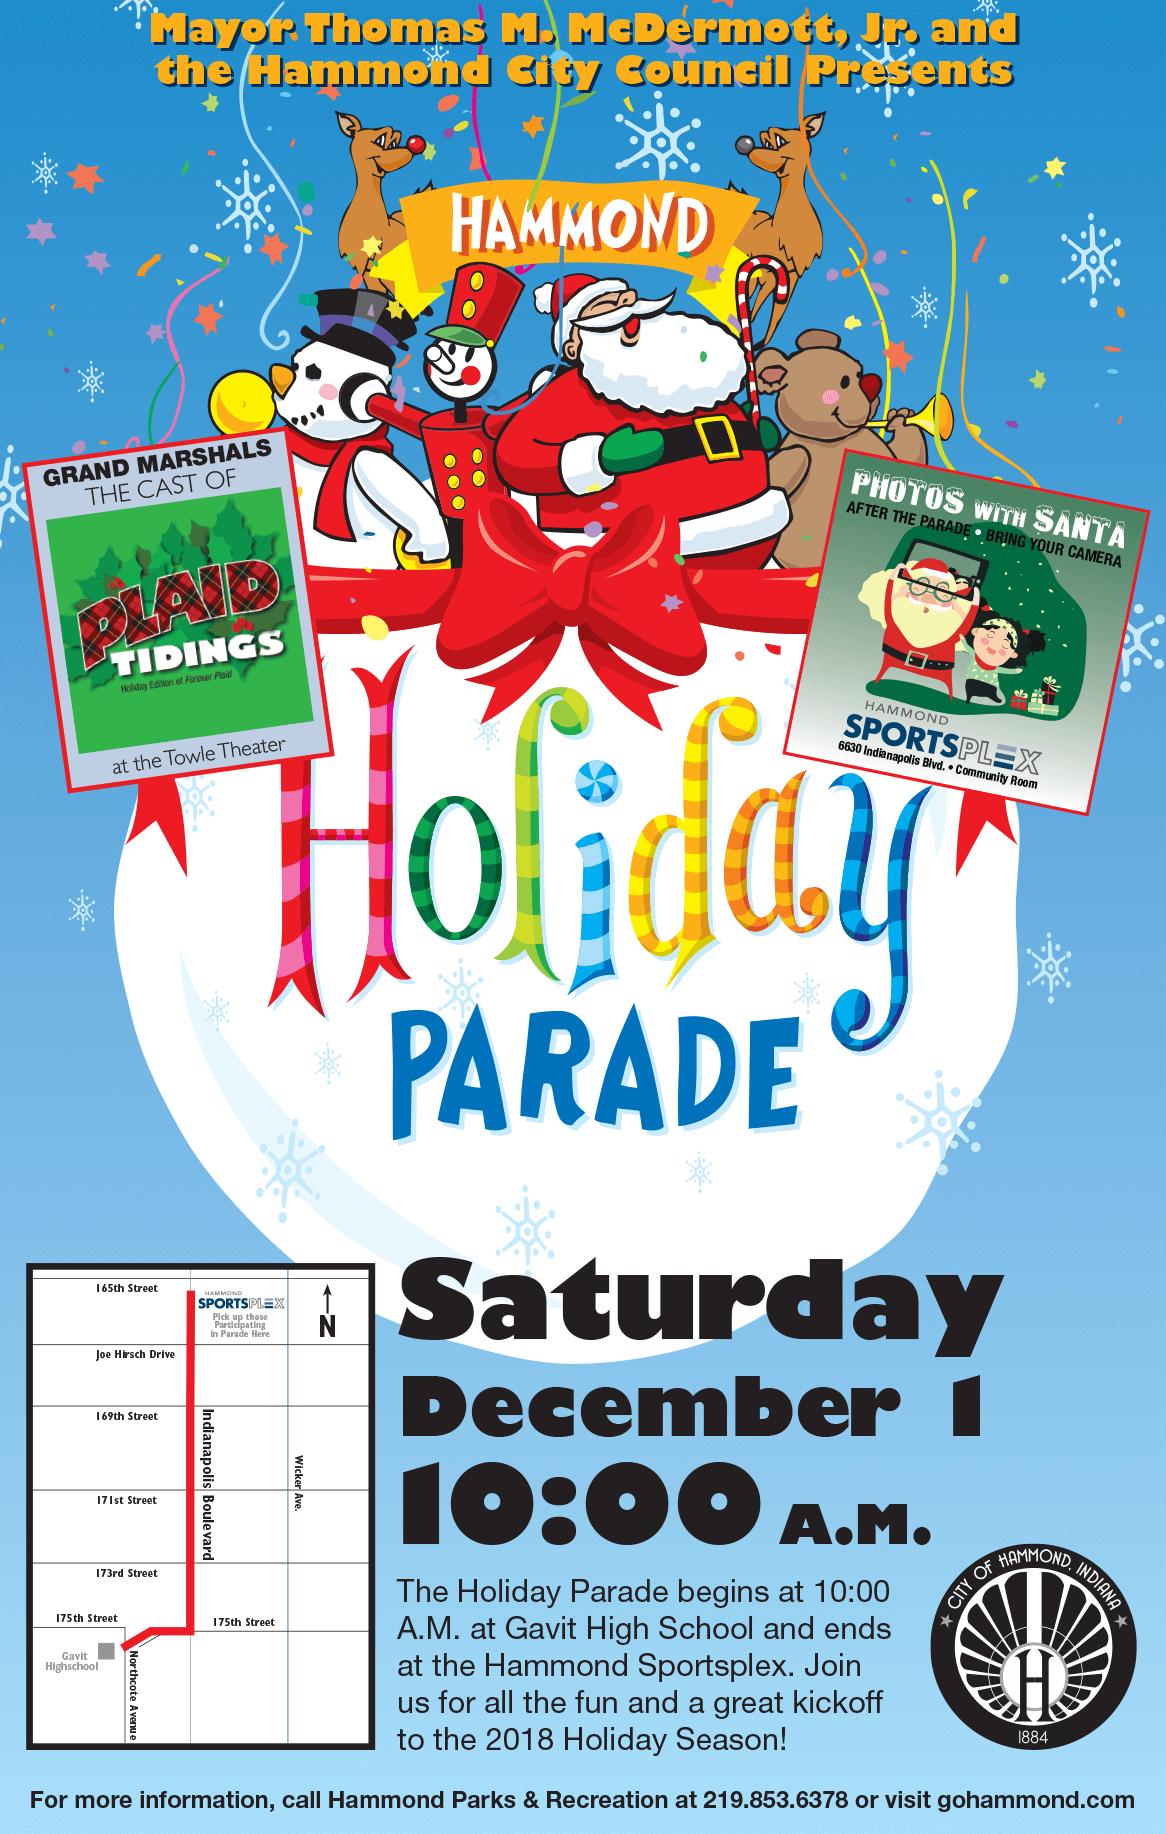 2018 Hammond Holiday Parade